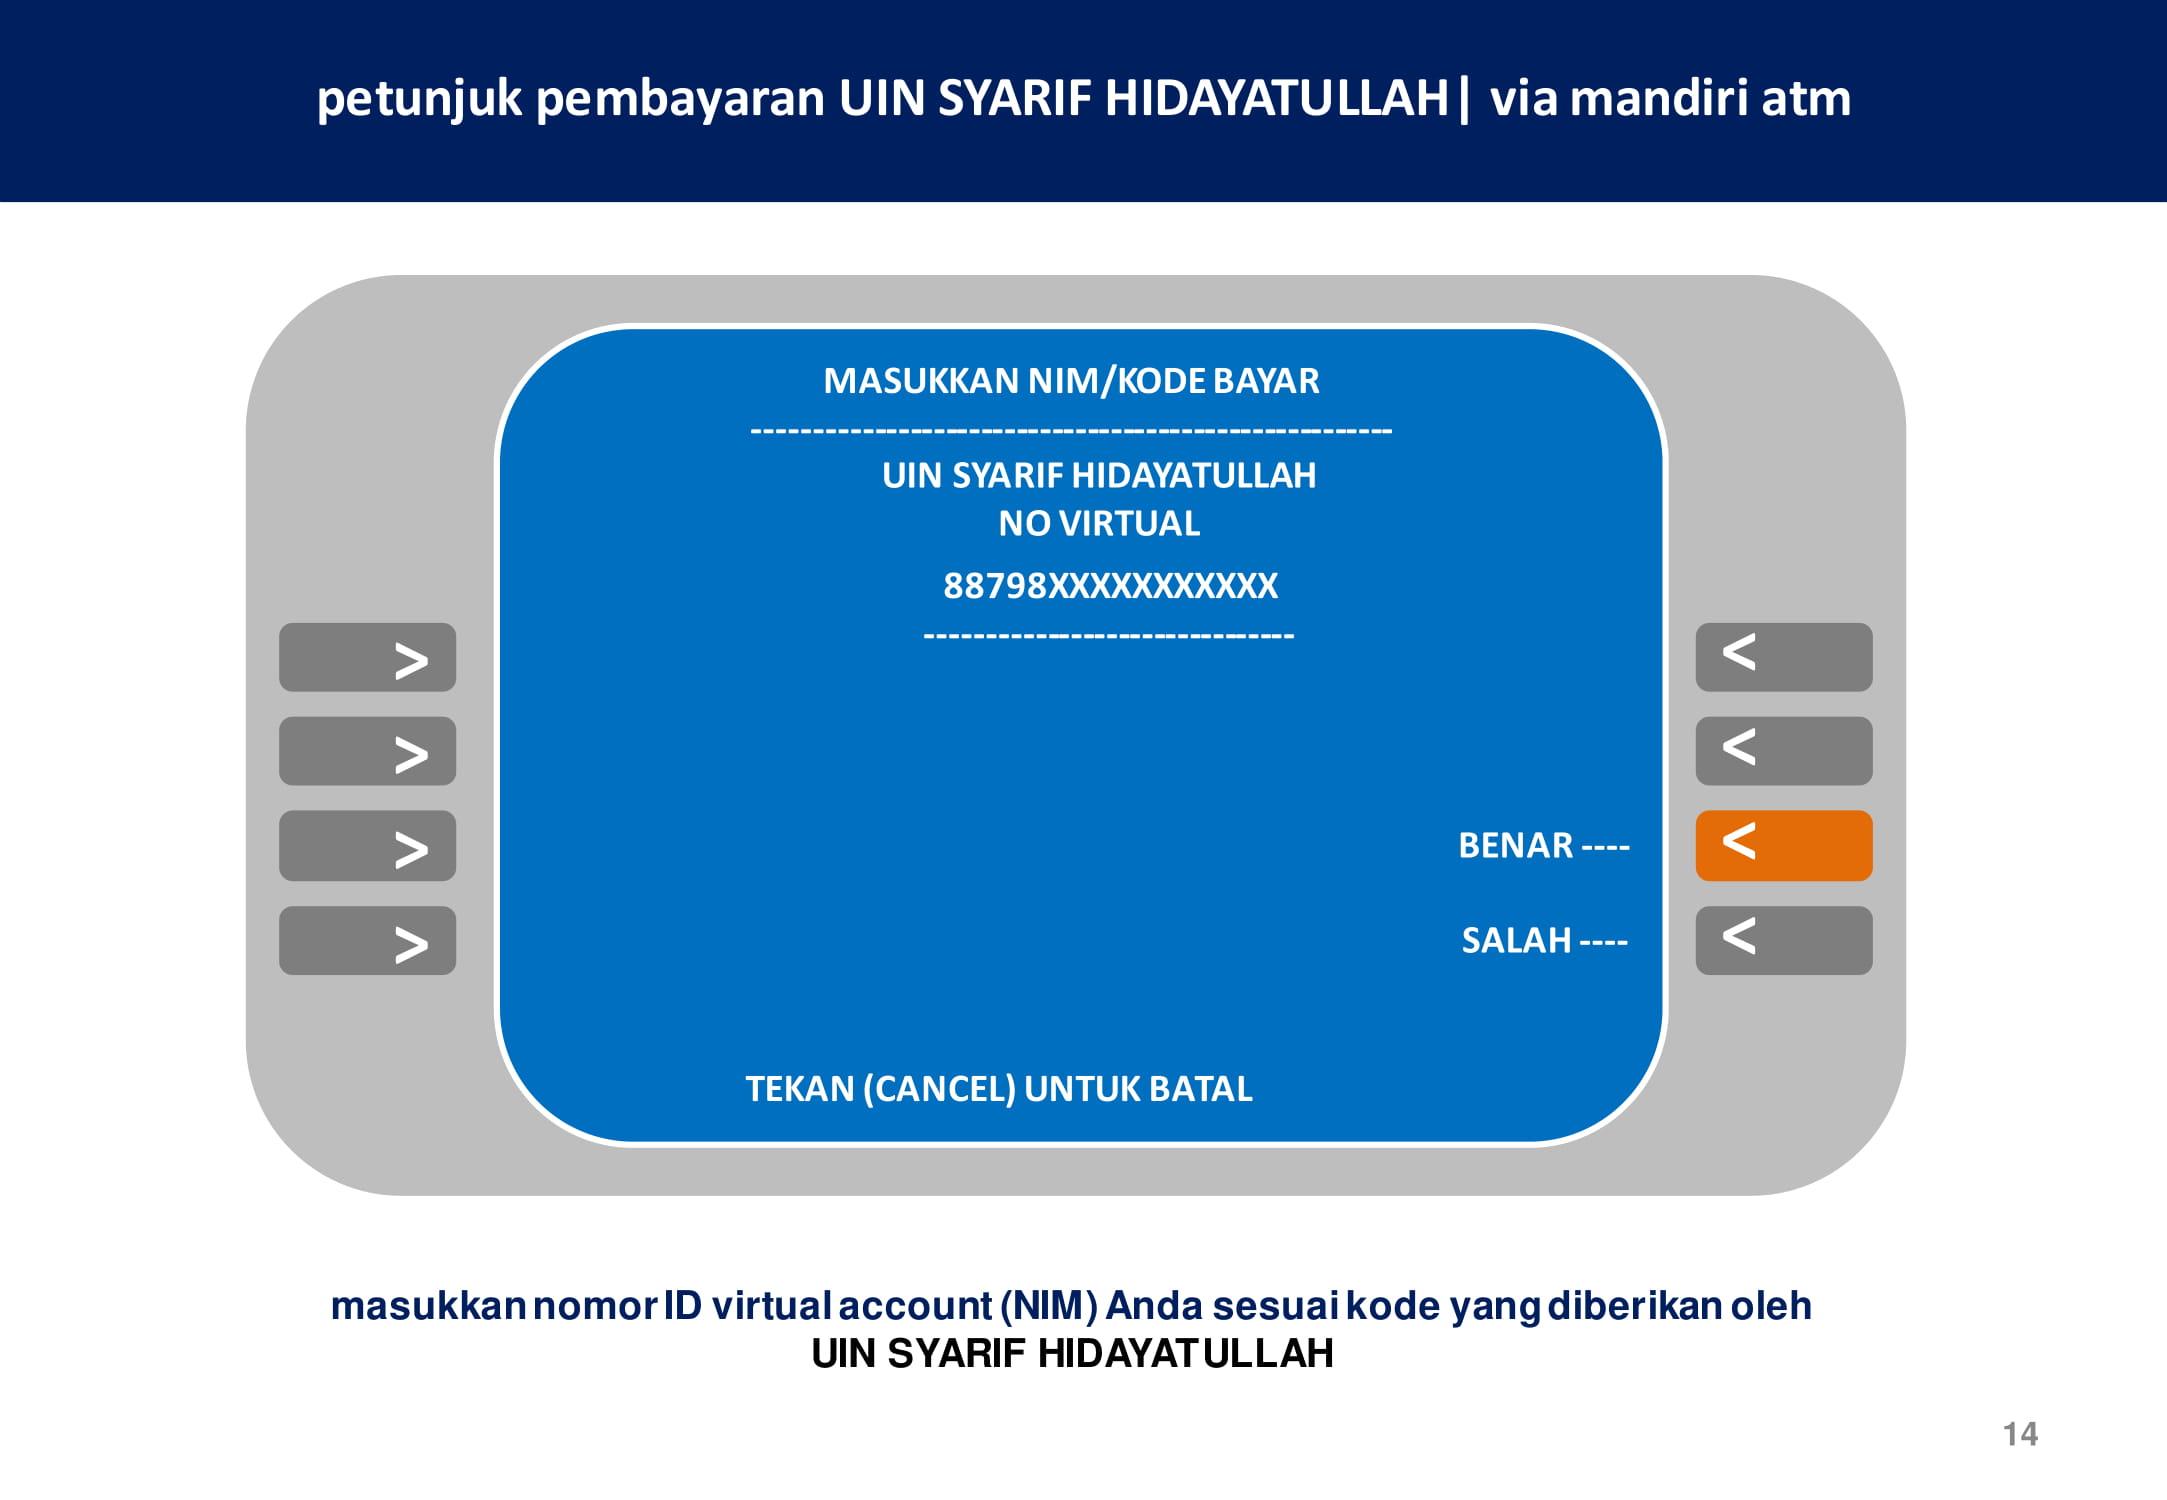 mandiri_atm_step5